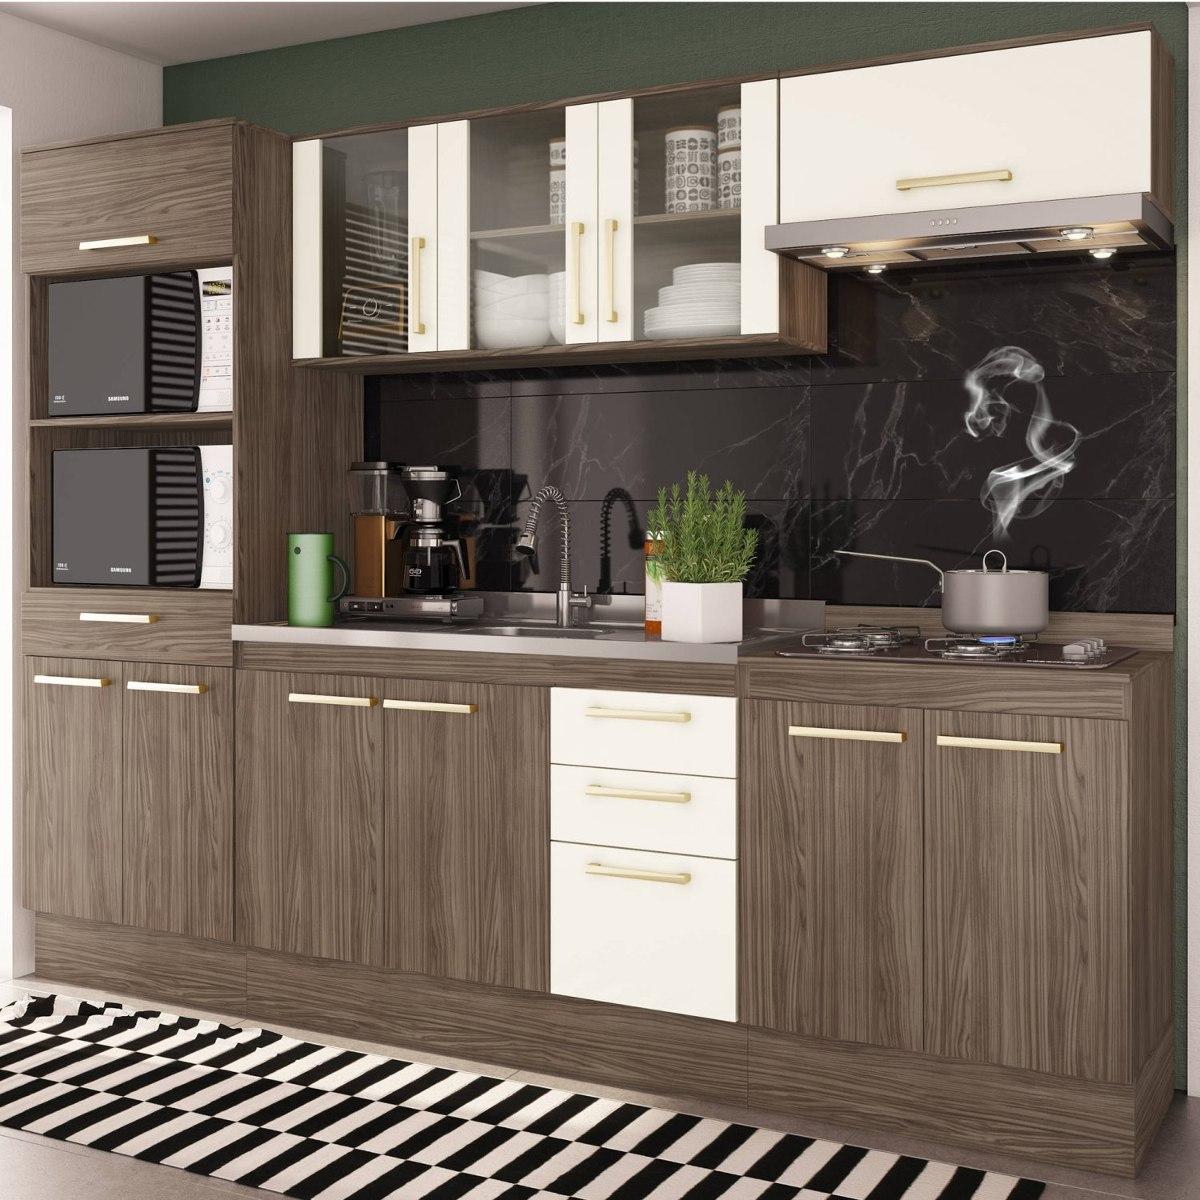 Cozinha Completa 5 Pe As Zafira A1899 Casamia N O Bi R 1 159 90